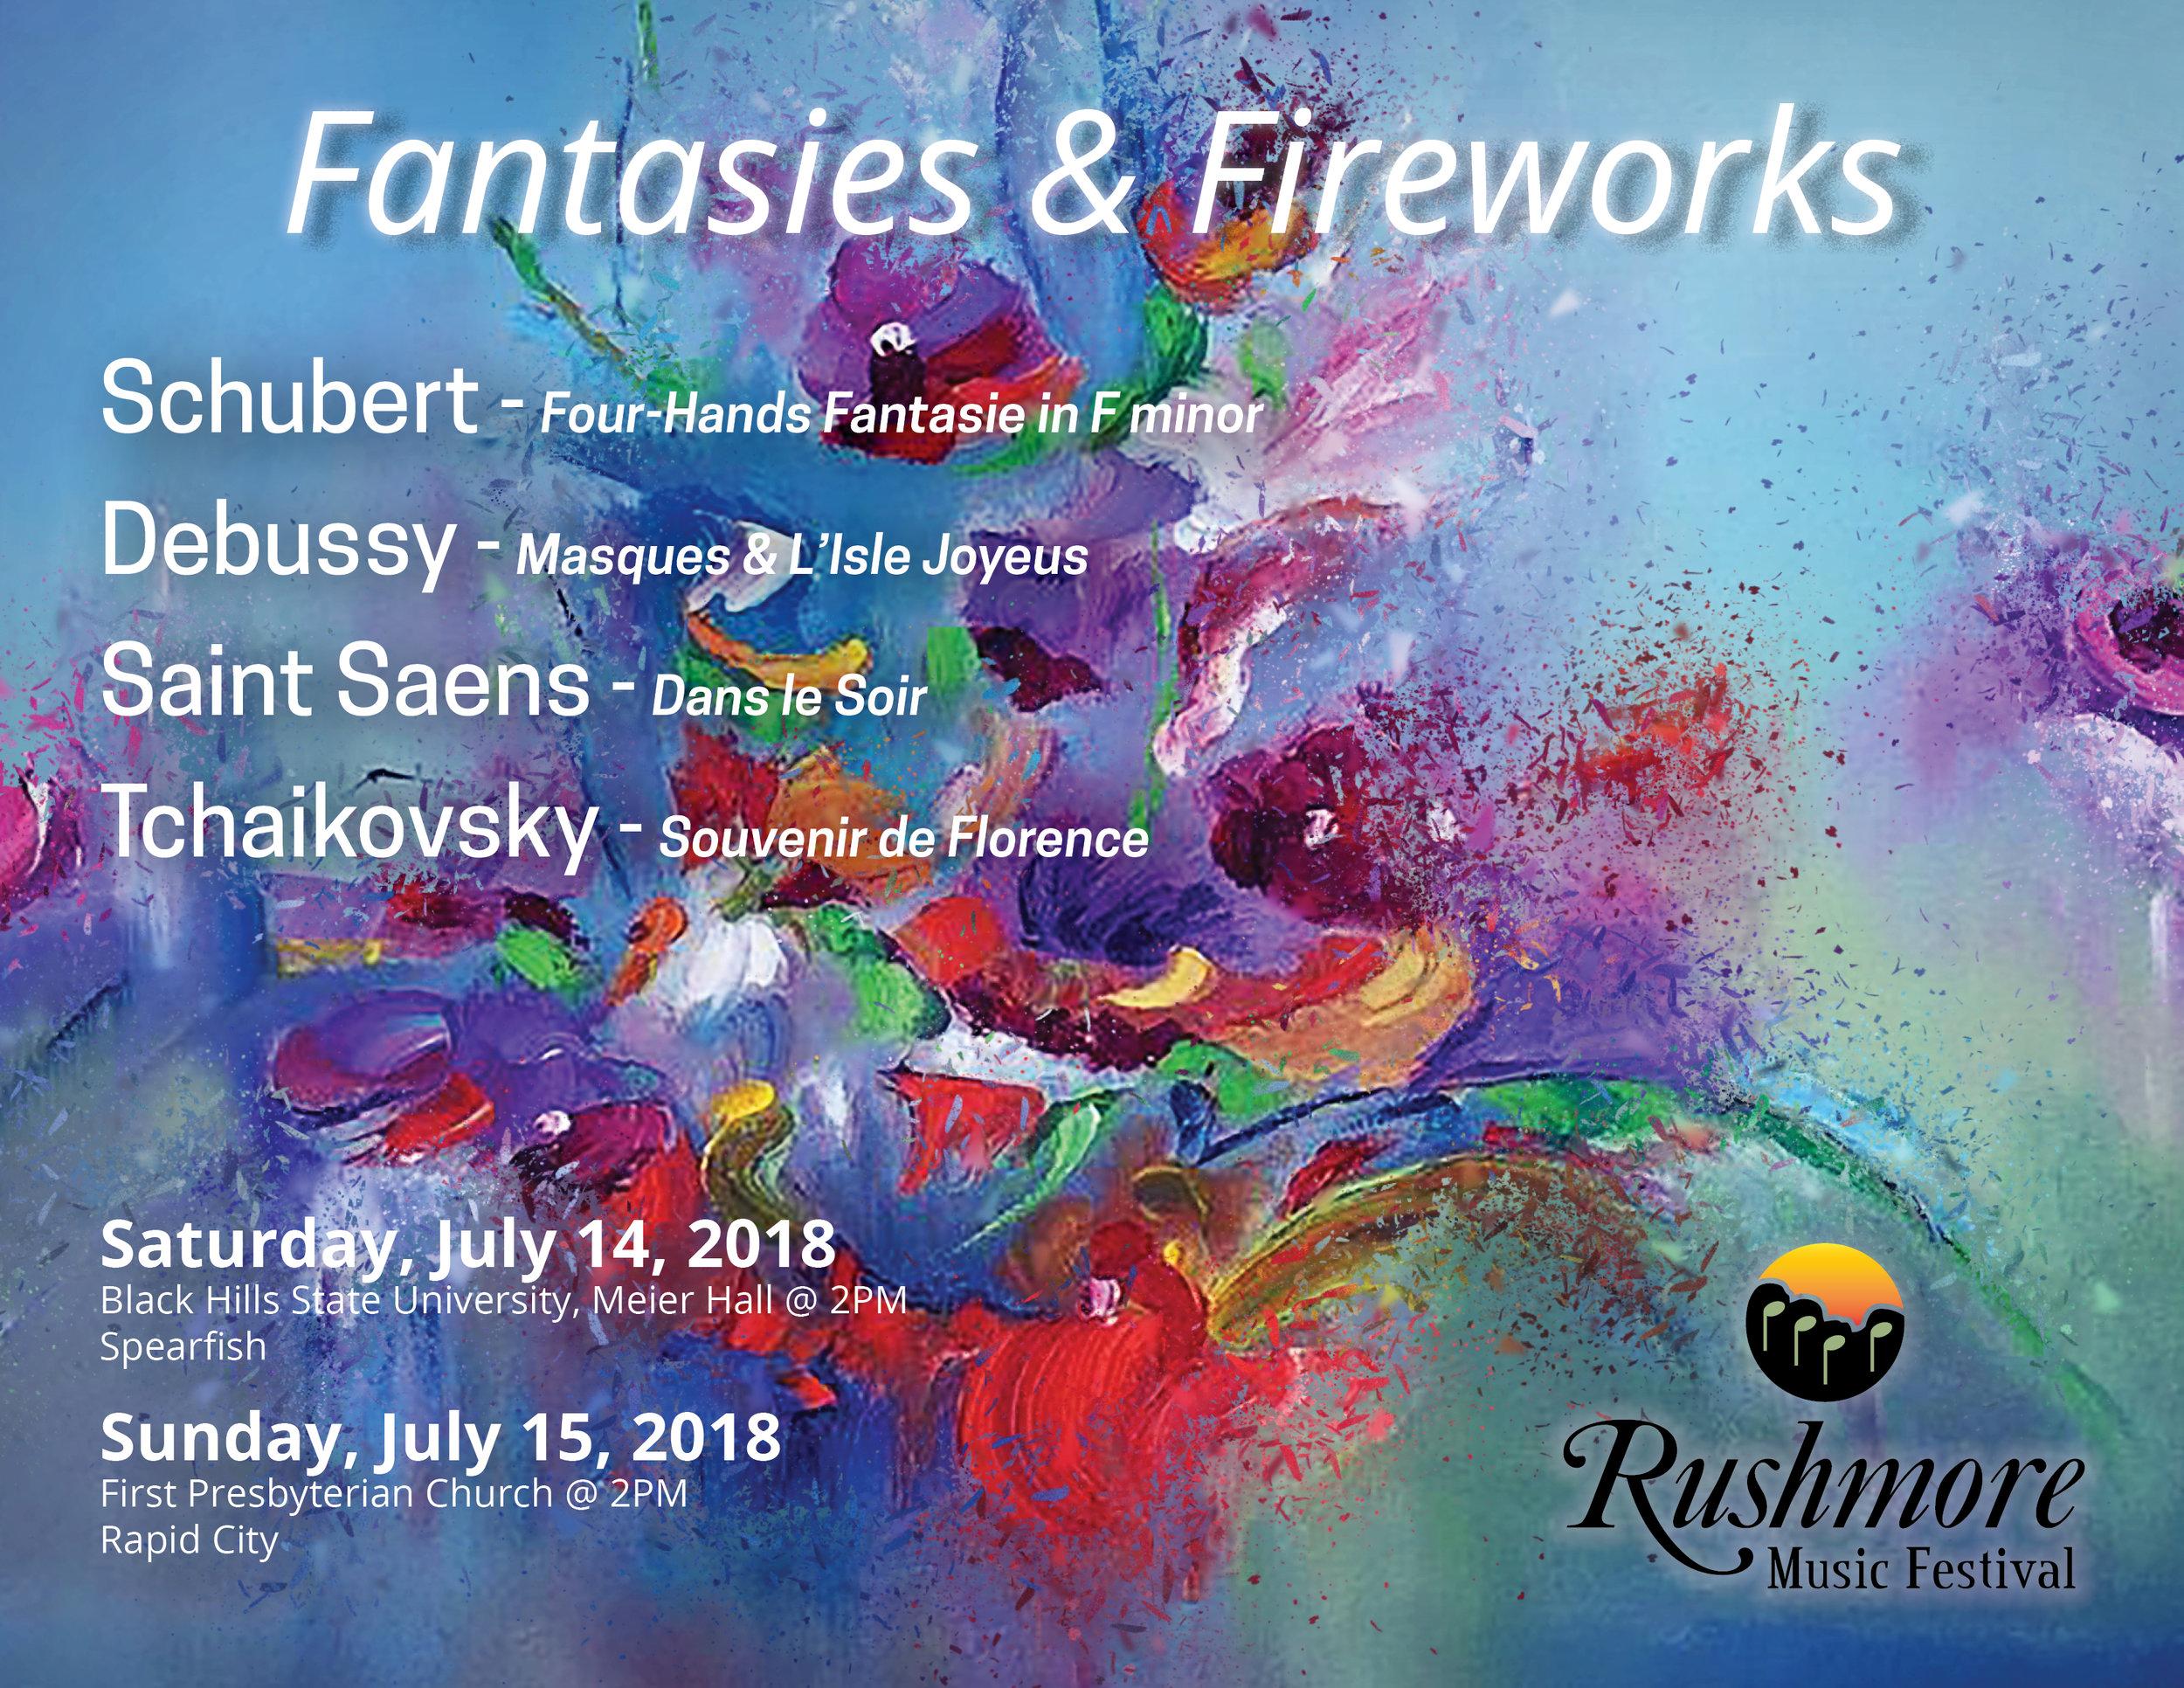 Fantasy's and Fireworks3.jpg